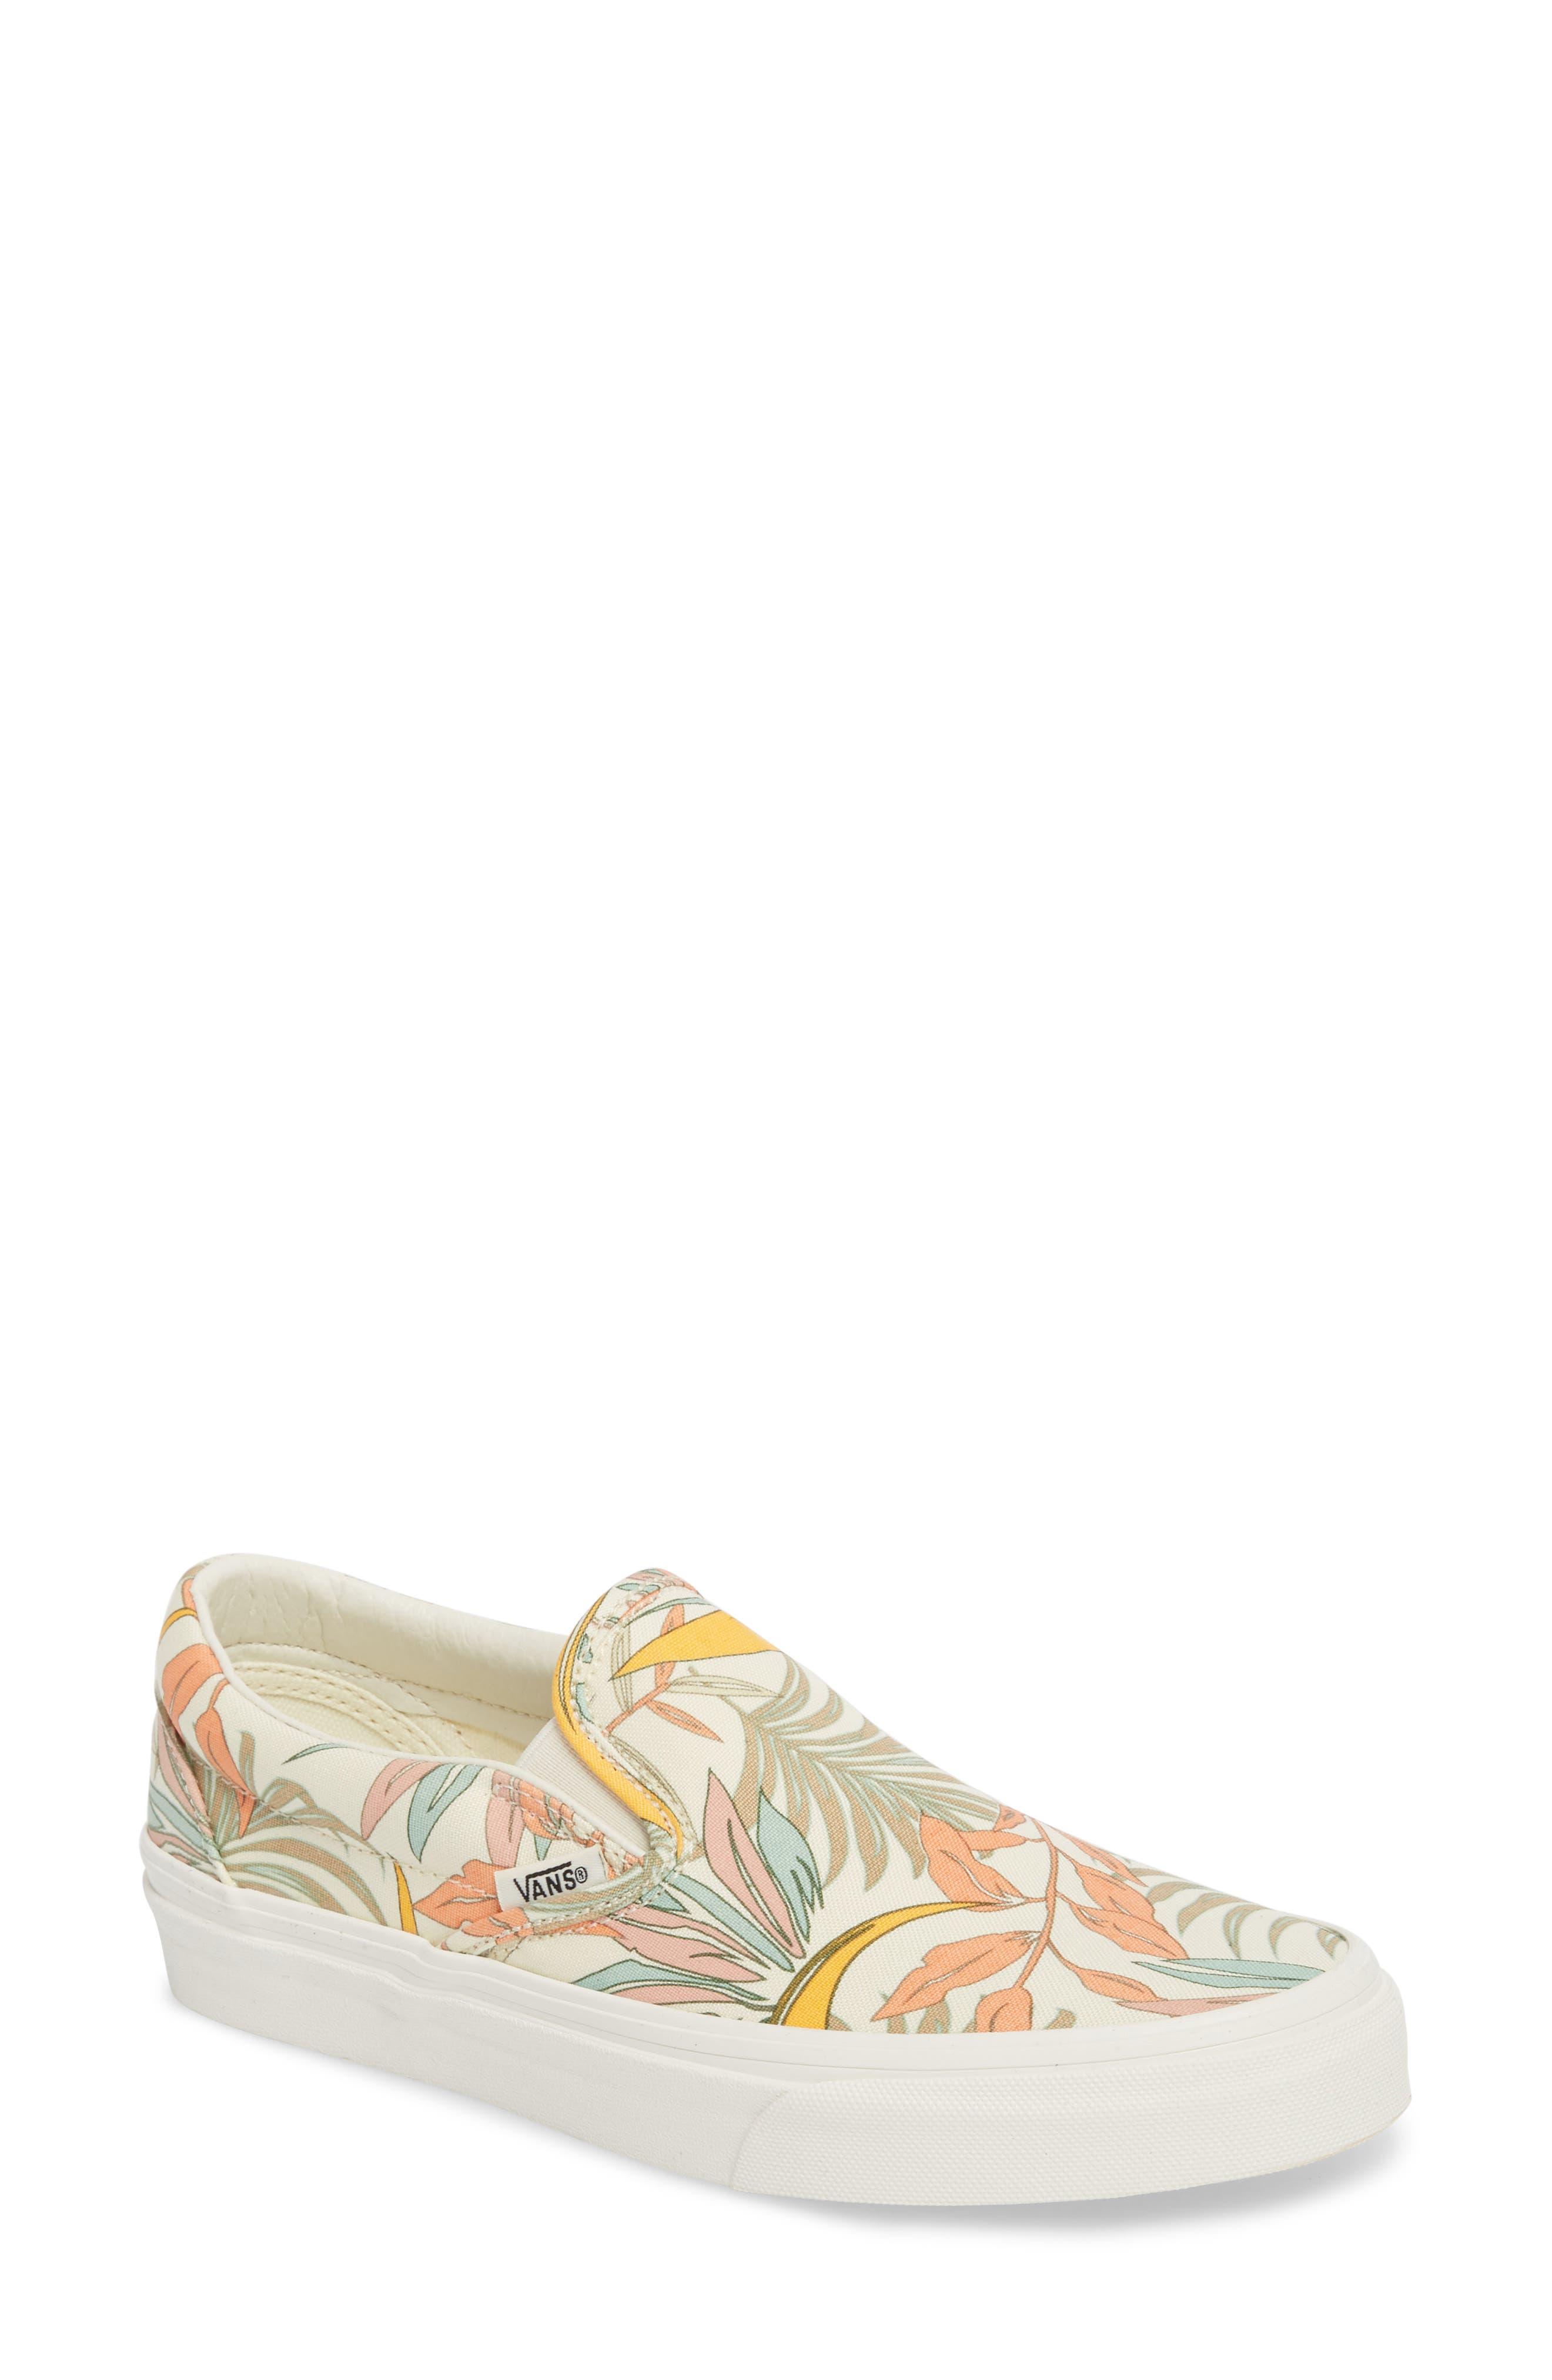 ,                             Classic Slip-On Sneaker,                             Main thumbnail 123, color,                             251